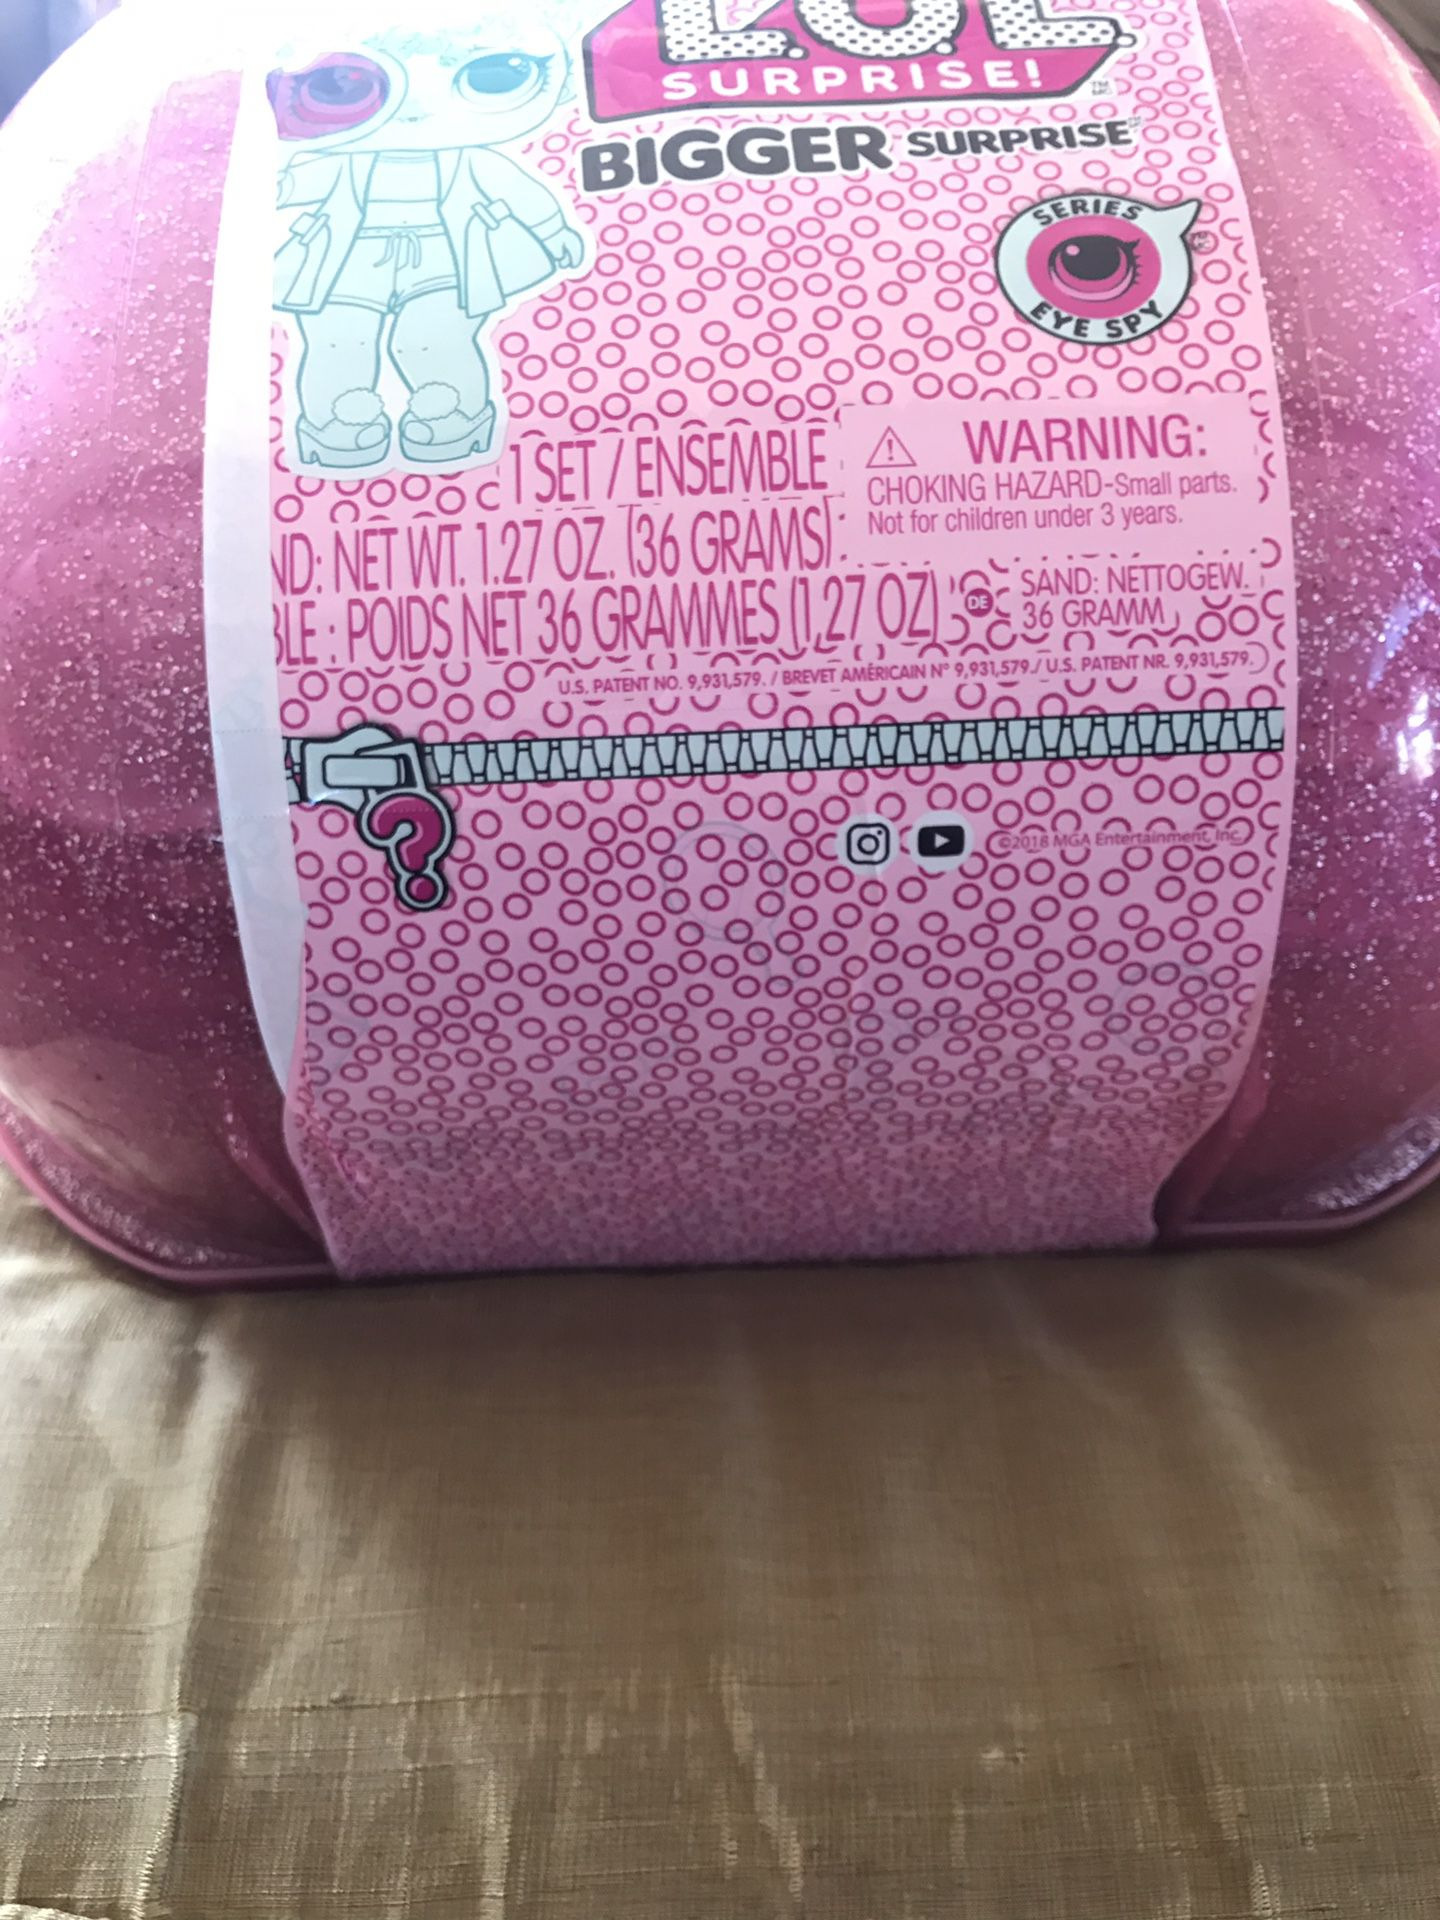 New L.O.L Surprise! Bigger Surprise Christmas gift